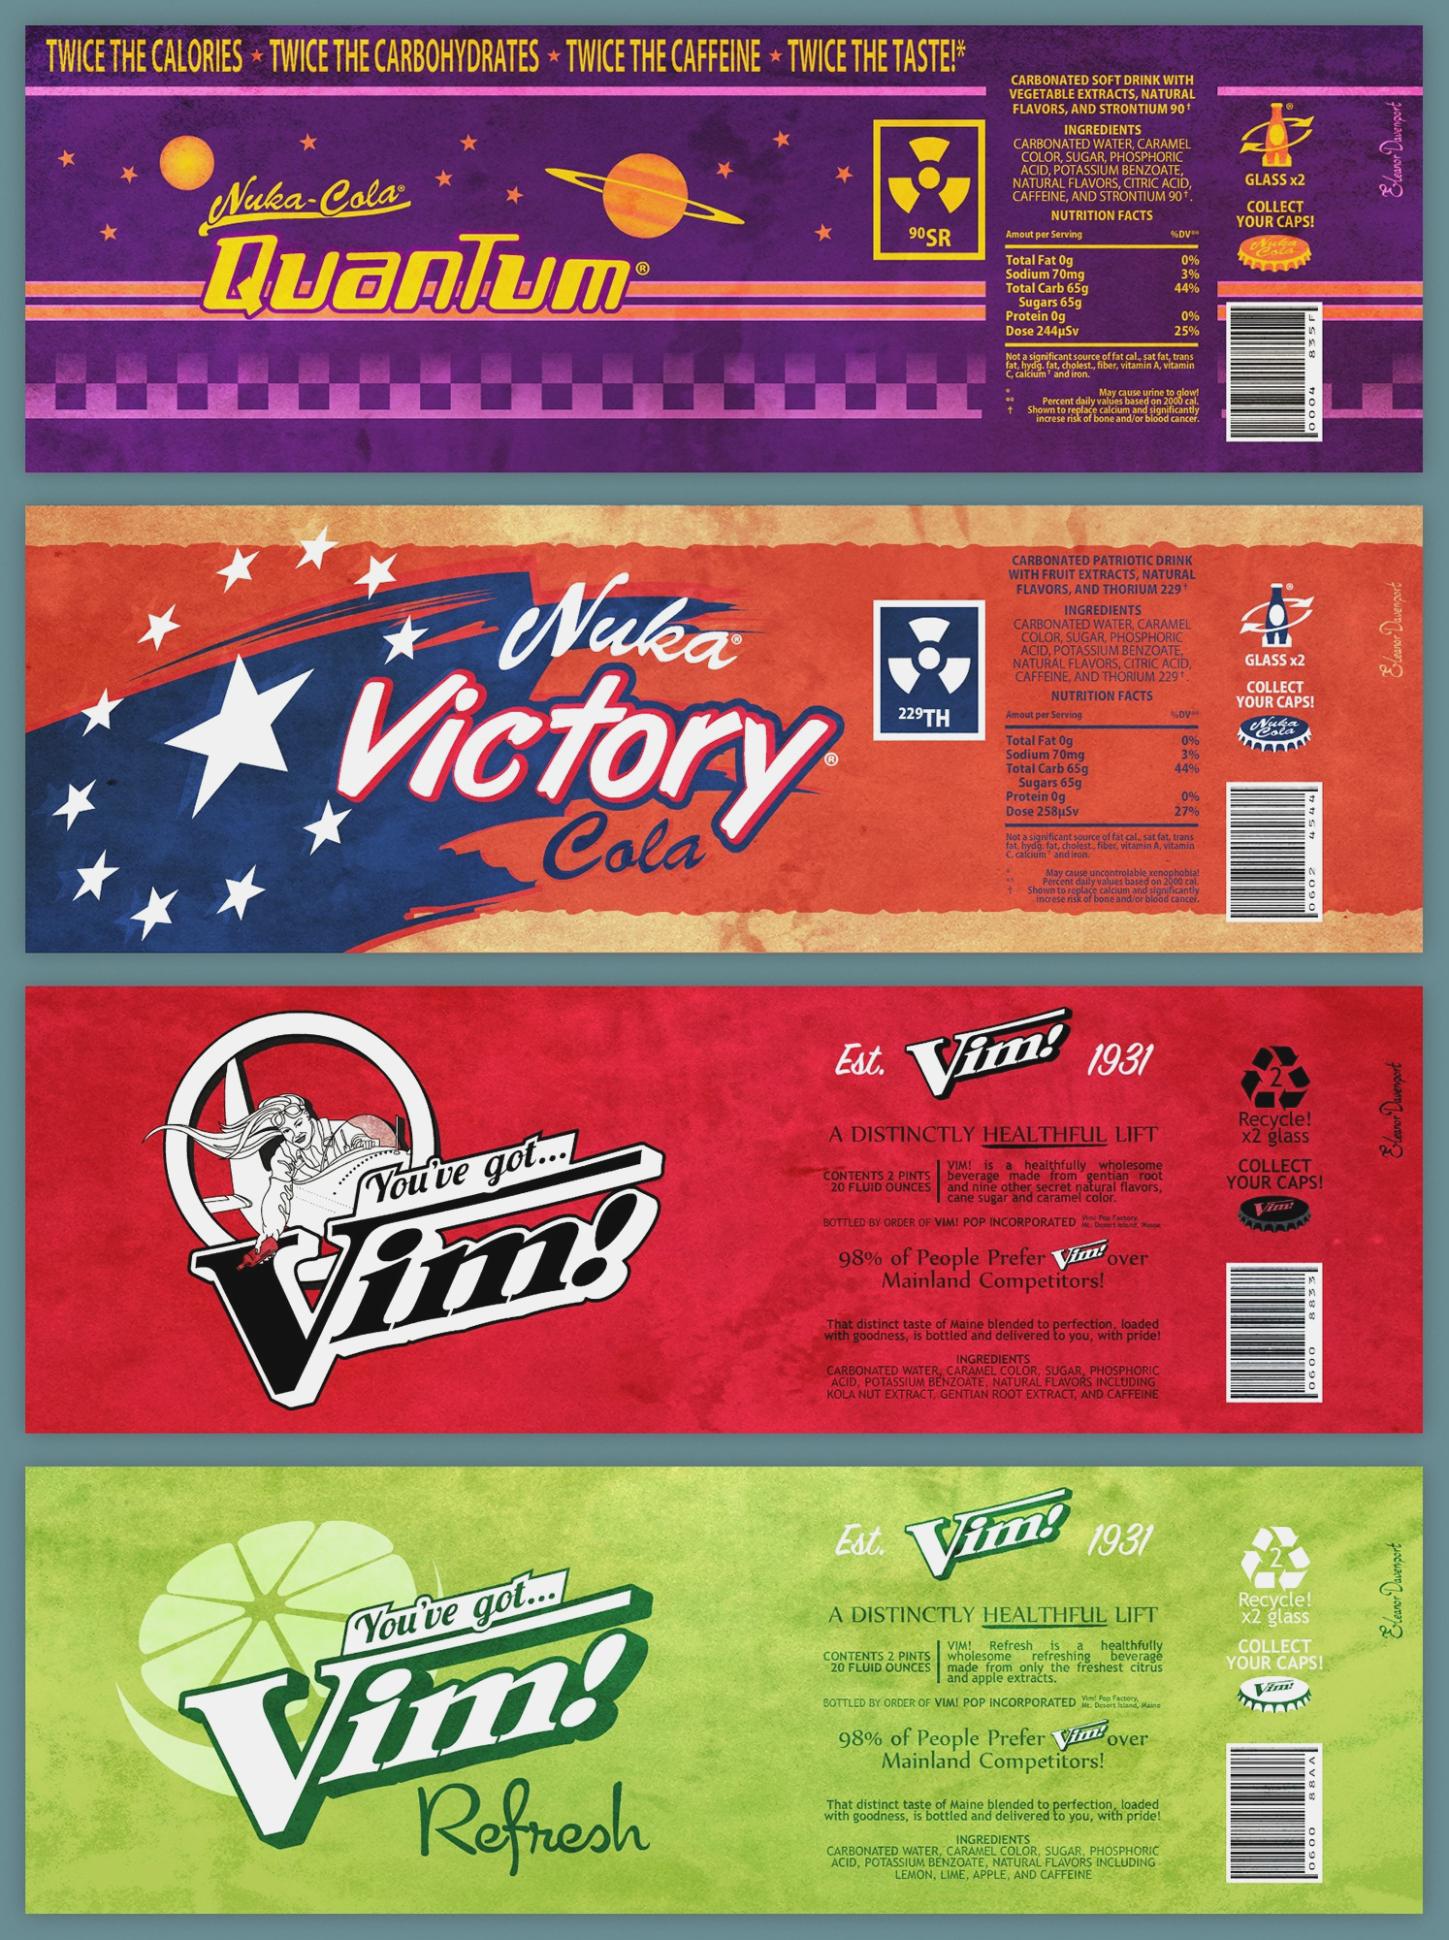 Free Printable Soda Vending Machine Labels Fallout Soda Labels I Got - Free Printable Pop Machine Labels